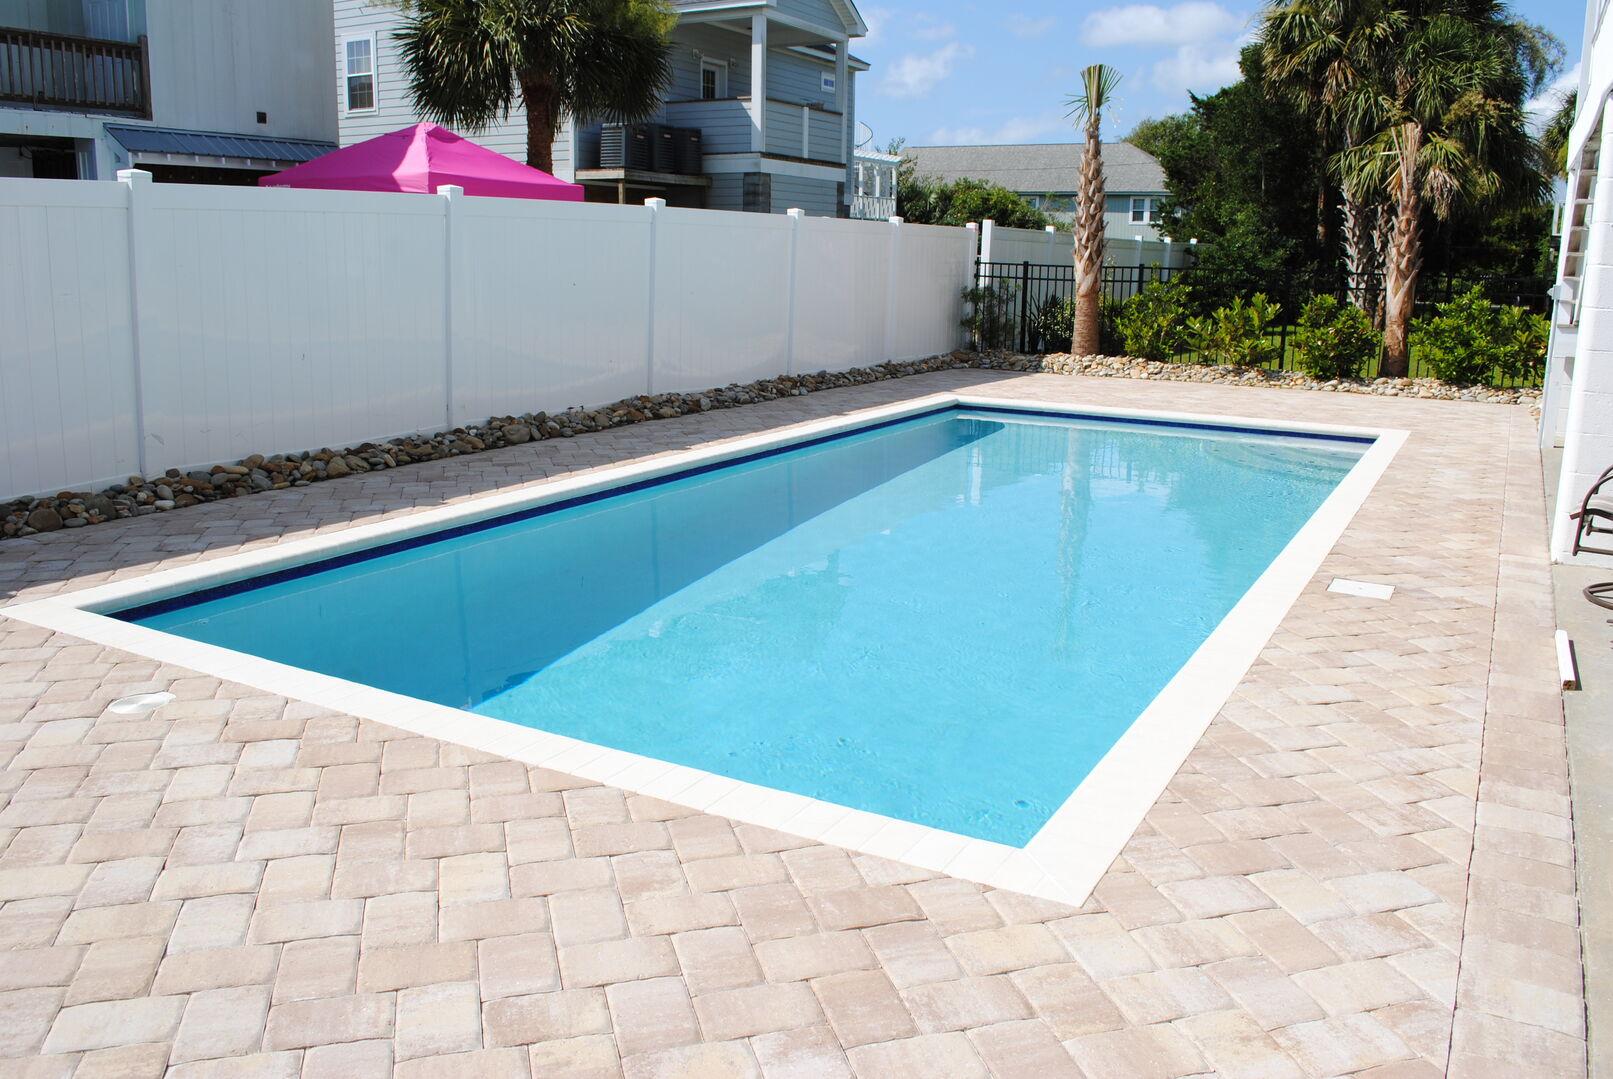 Private Inground Heated** Swimming Pool